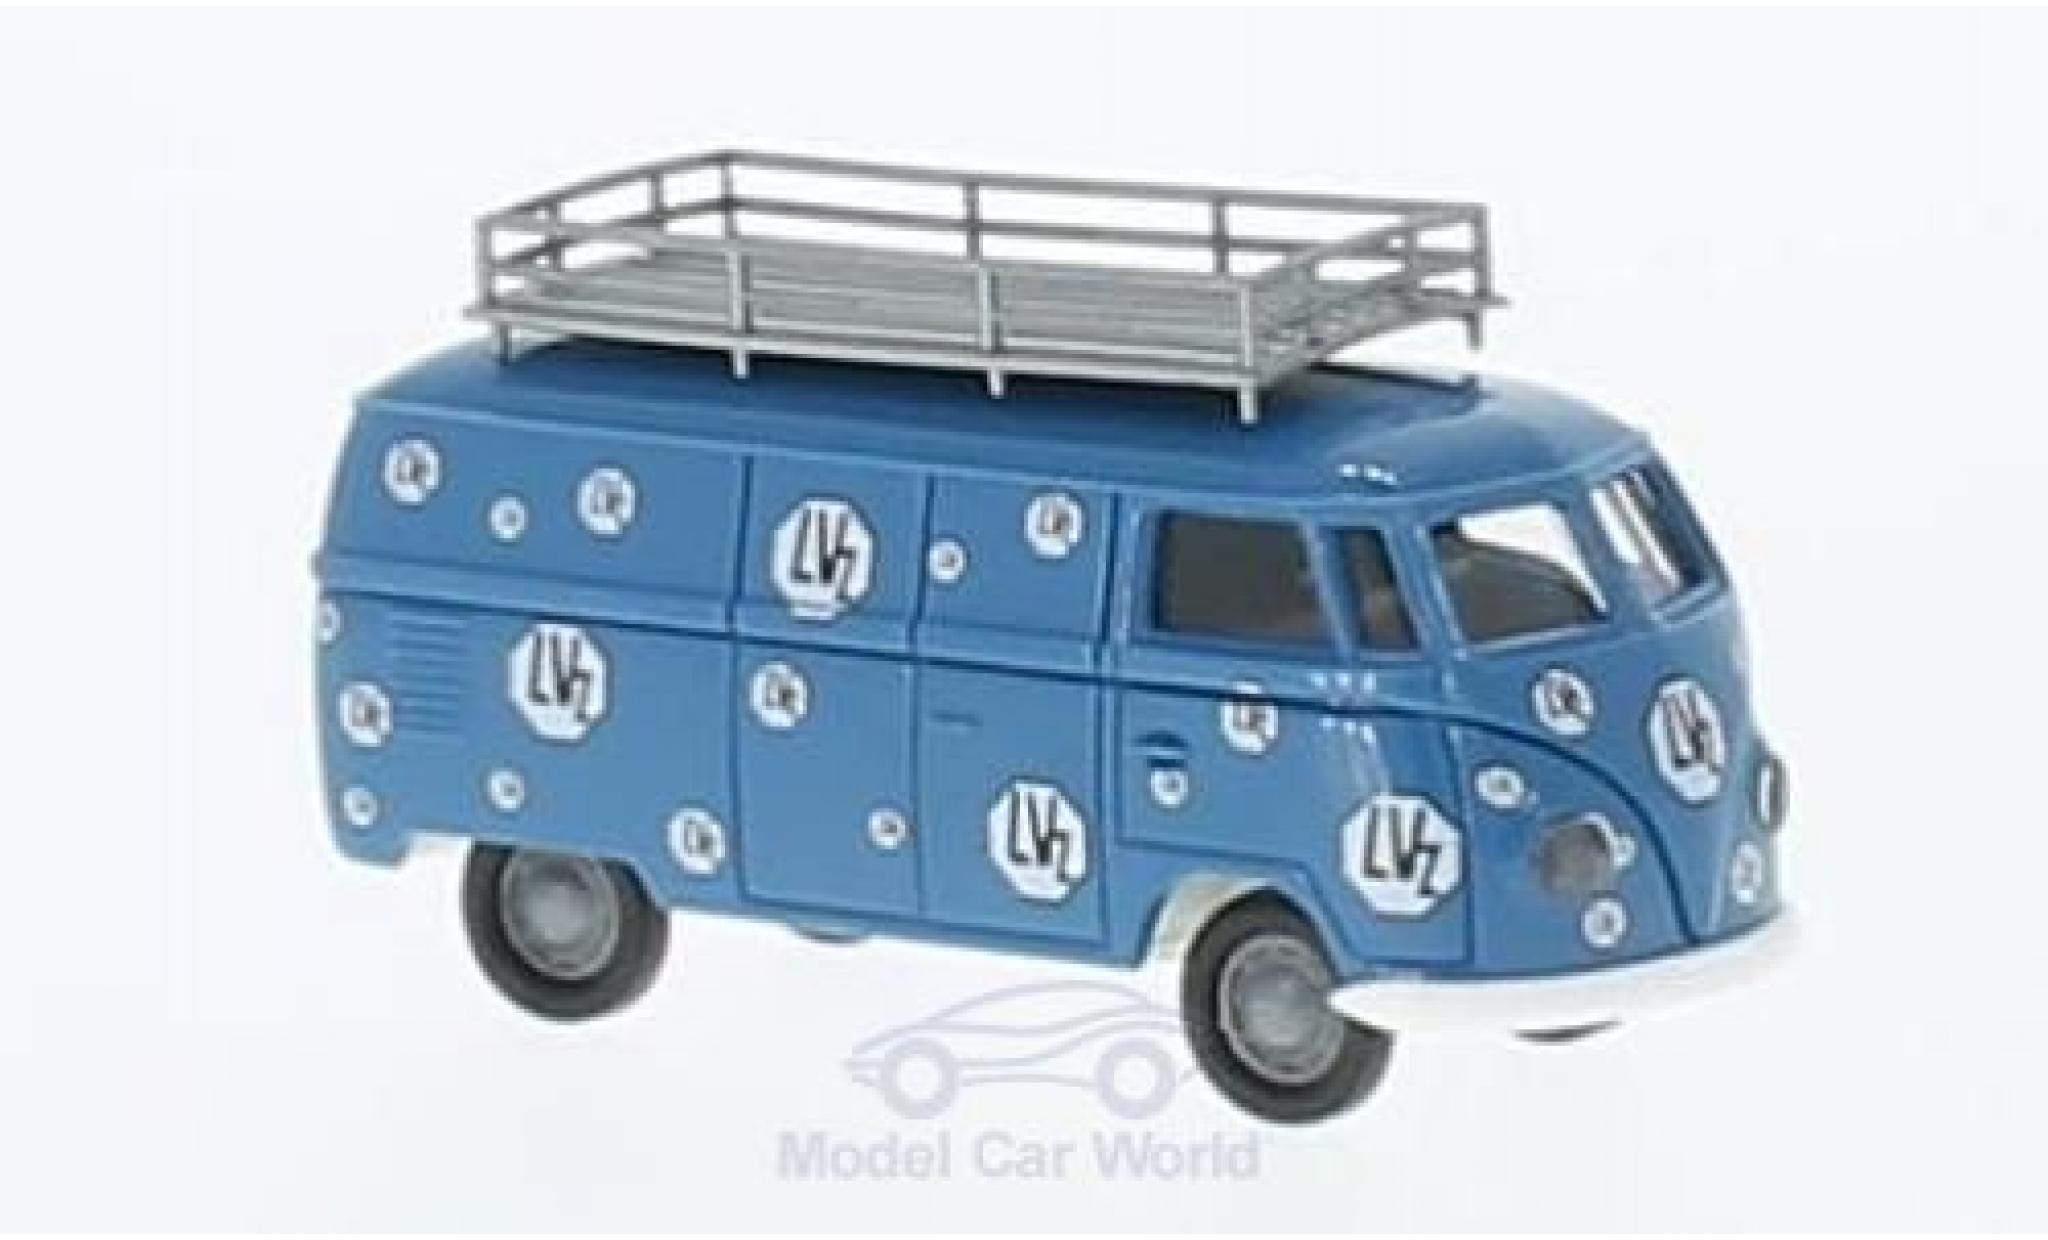 Volkswagen T1 A 1/87 Brekina a LVZ Kasten